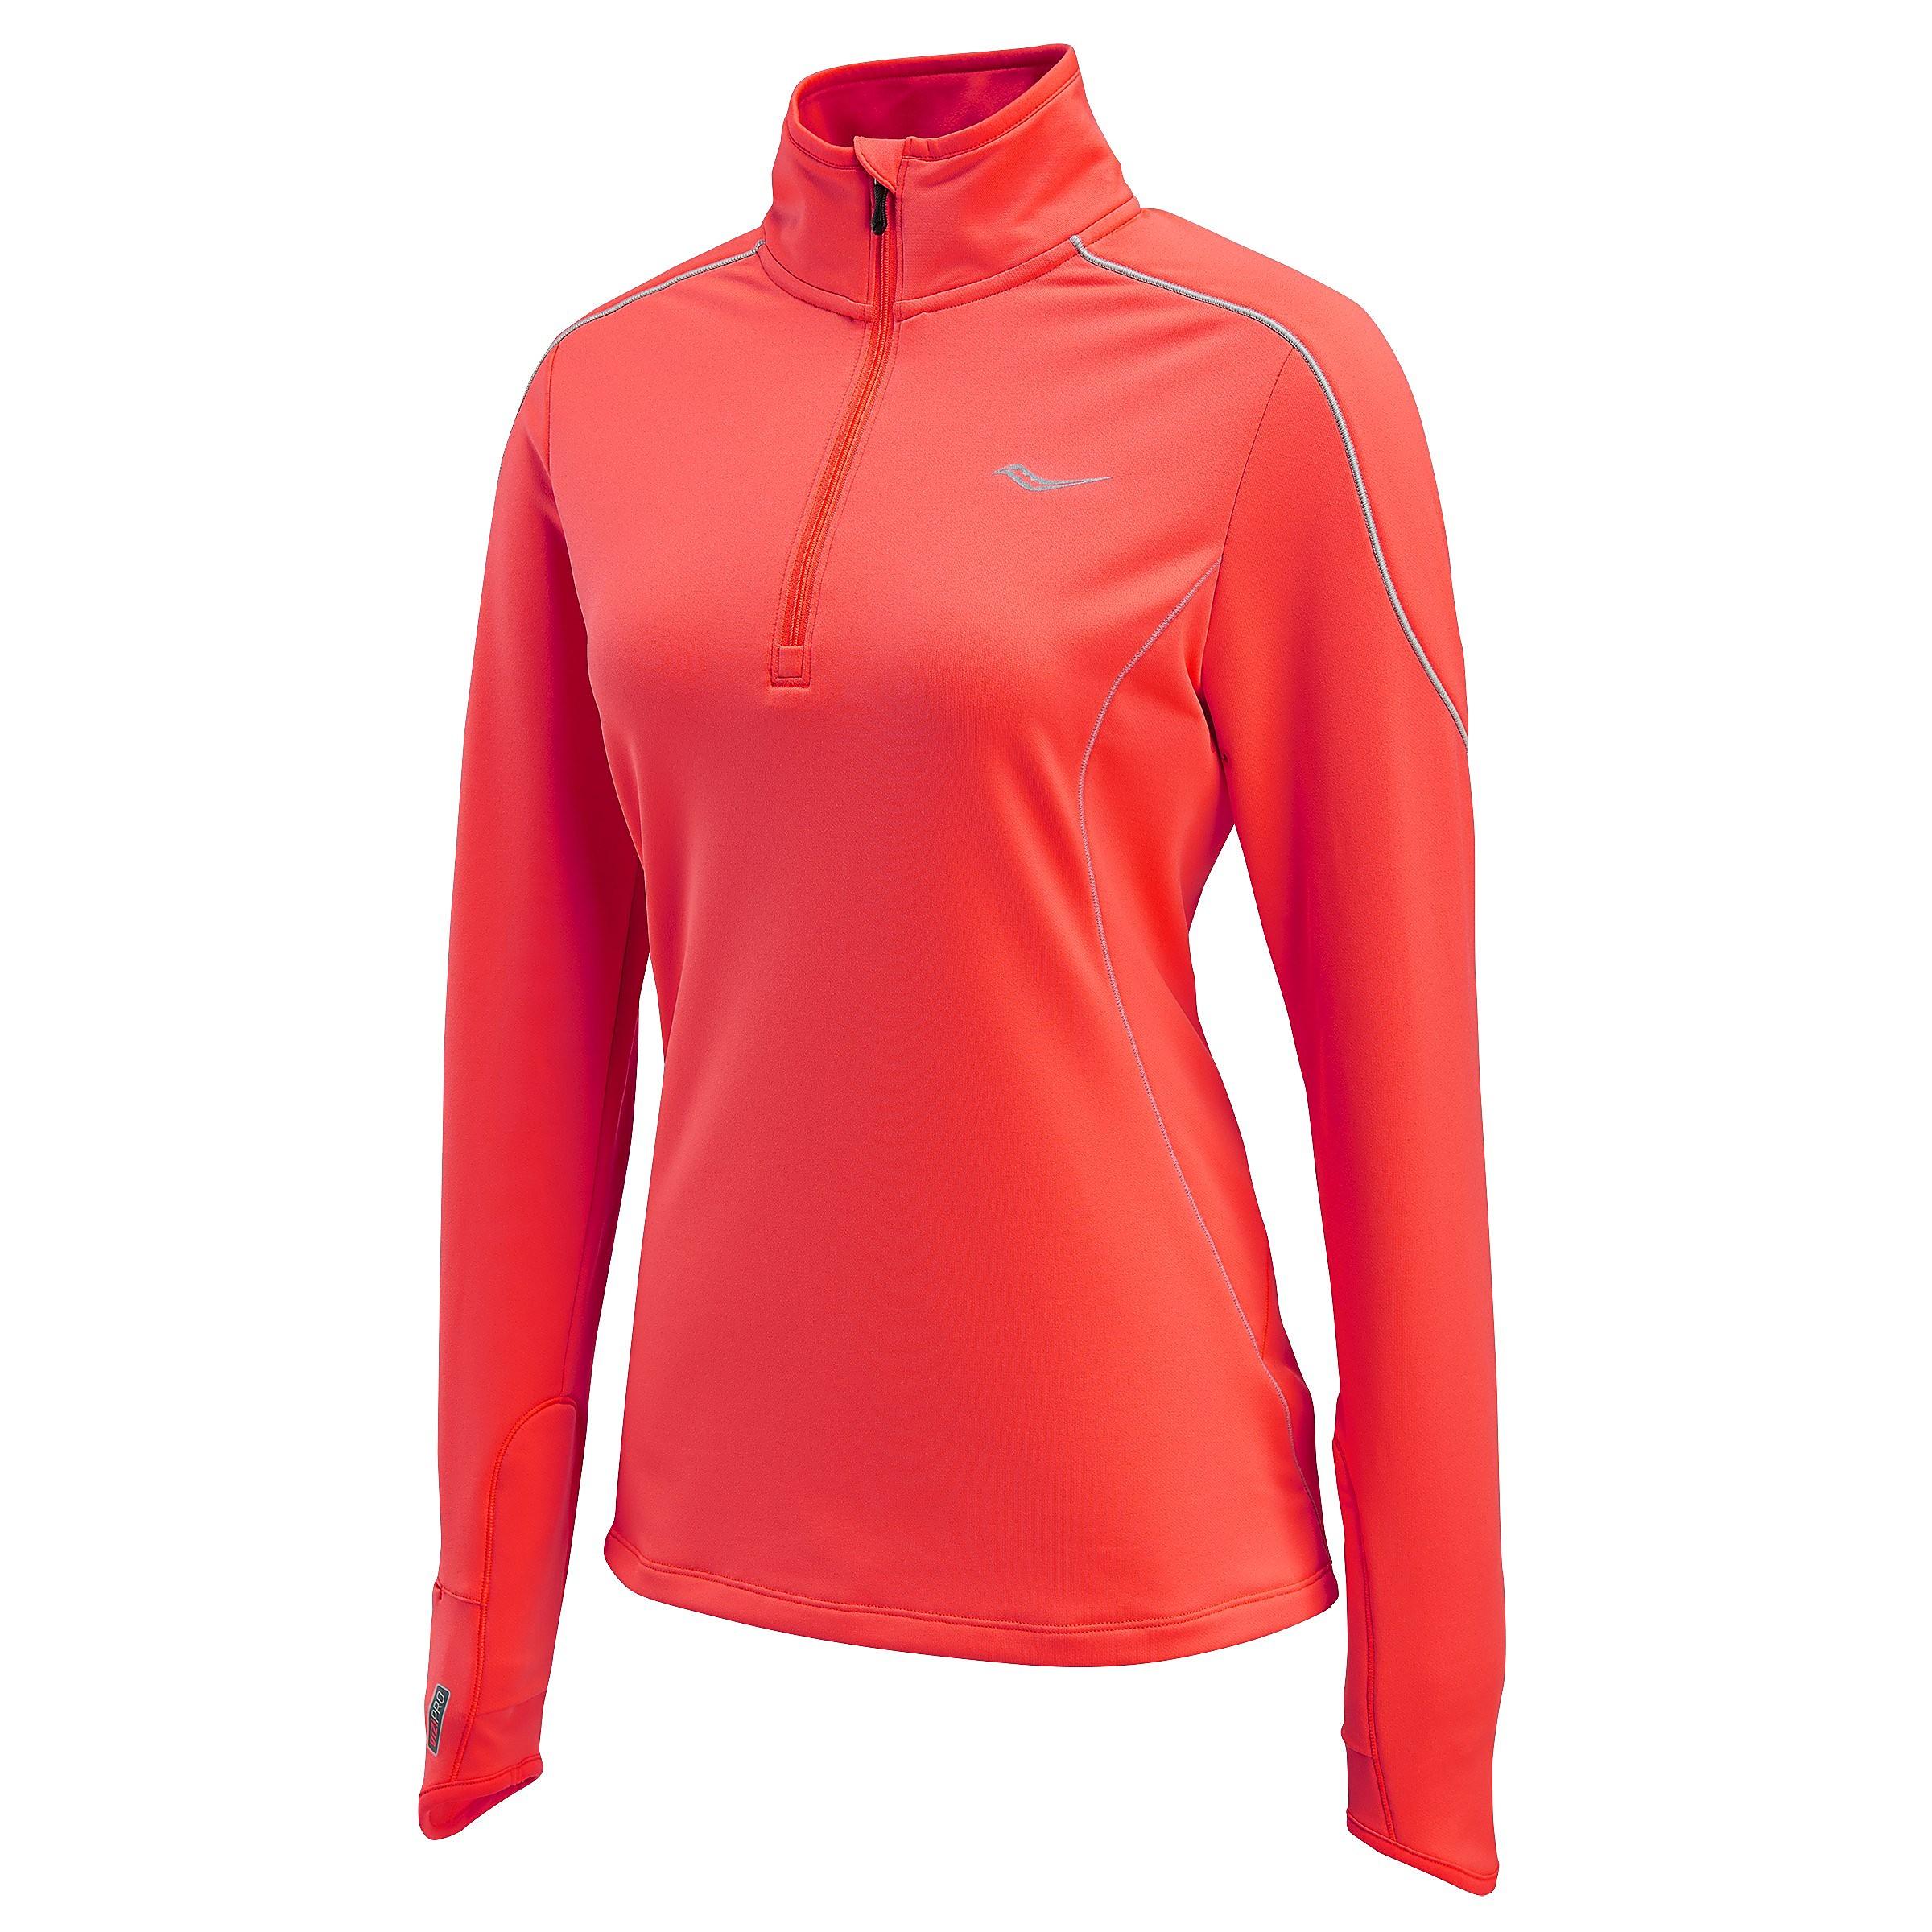 Saucony Omni Drylete Sport Ladies Top